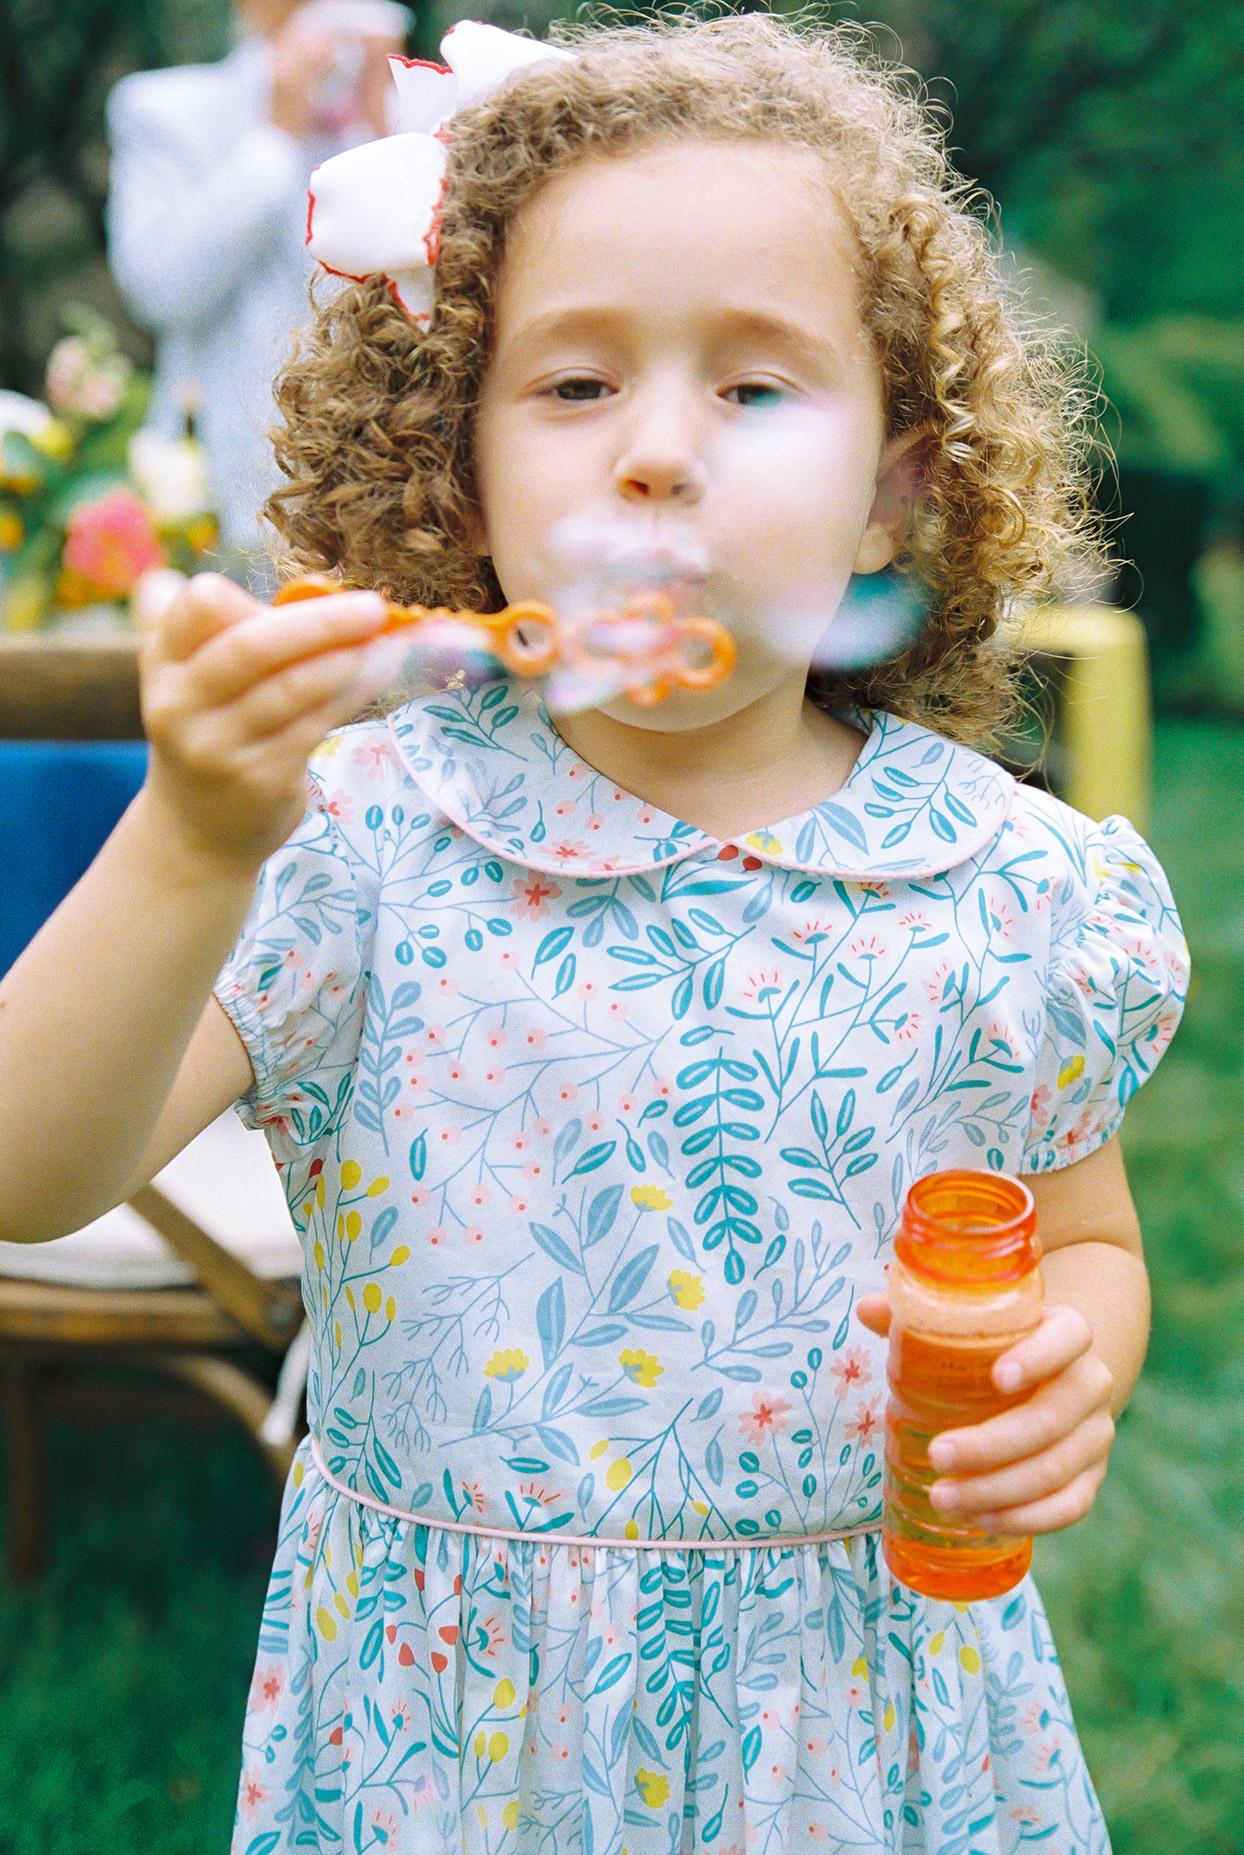 ashley scott wedding flower girl blowing bubbles